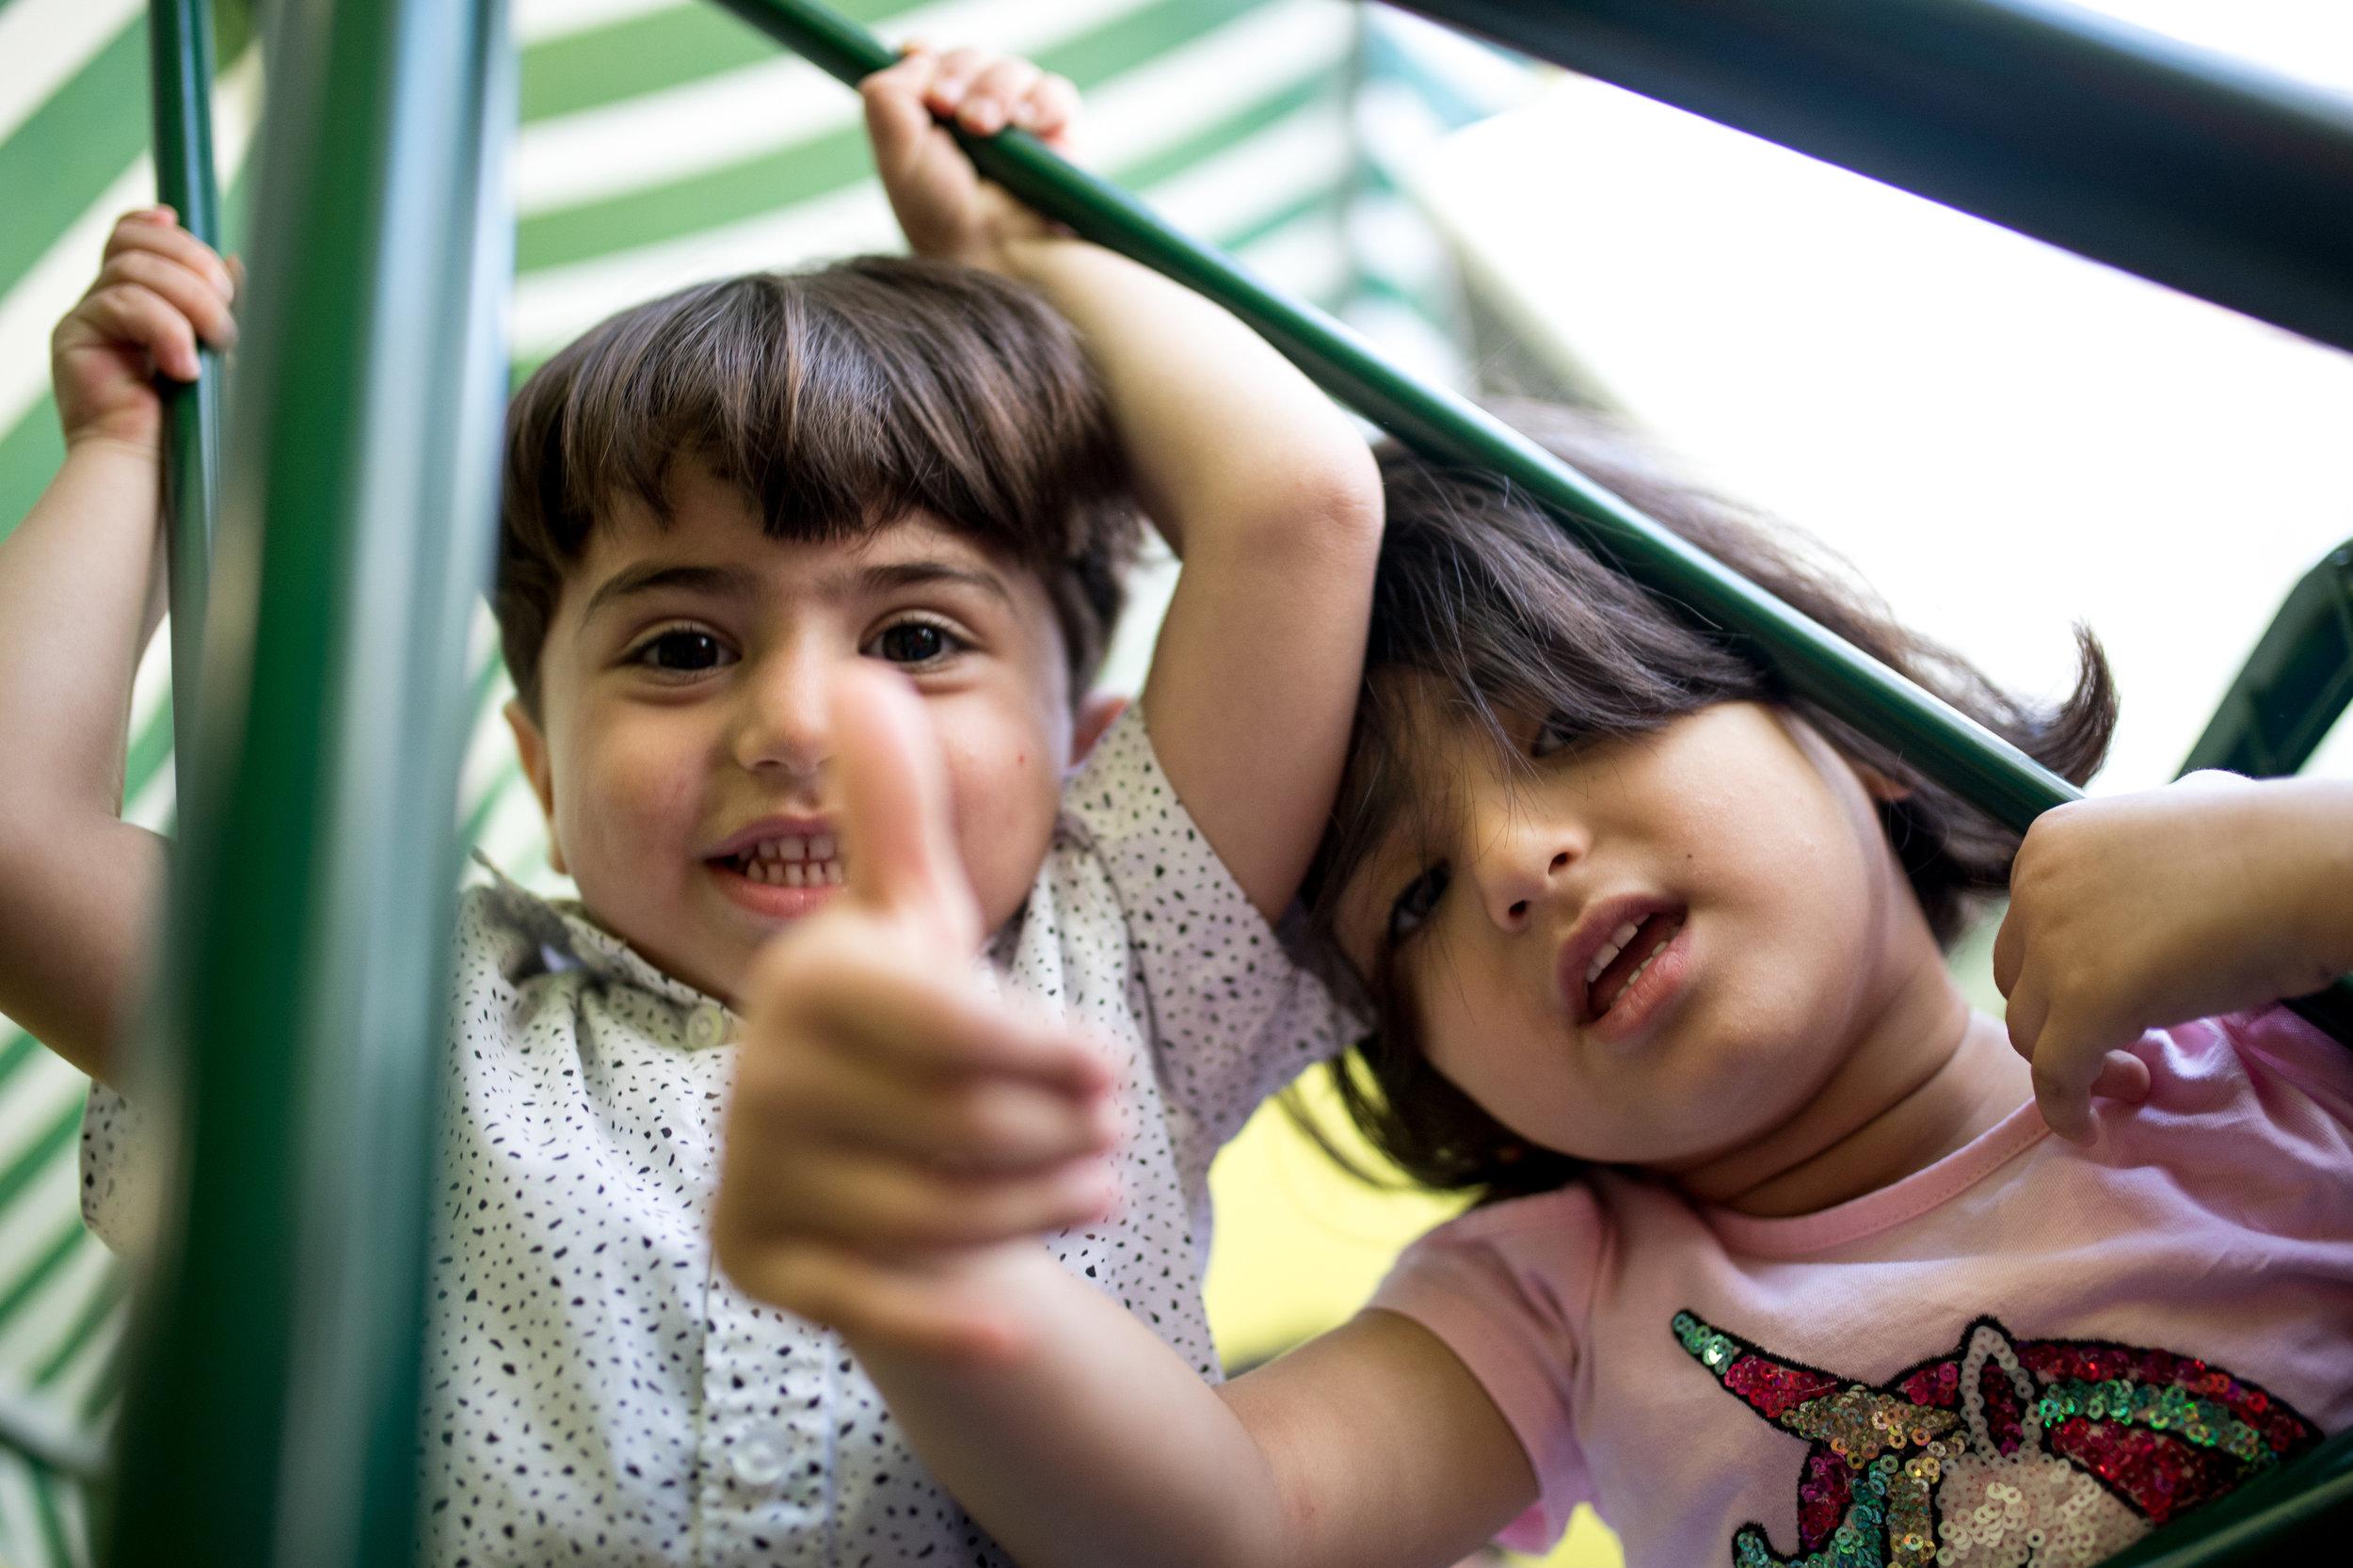 2018-07-03_Dania Al Bouchi, 30, Dunya Al Khayal Kindergarten, Gaziantep, TK_0044.jpg